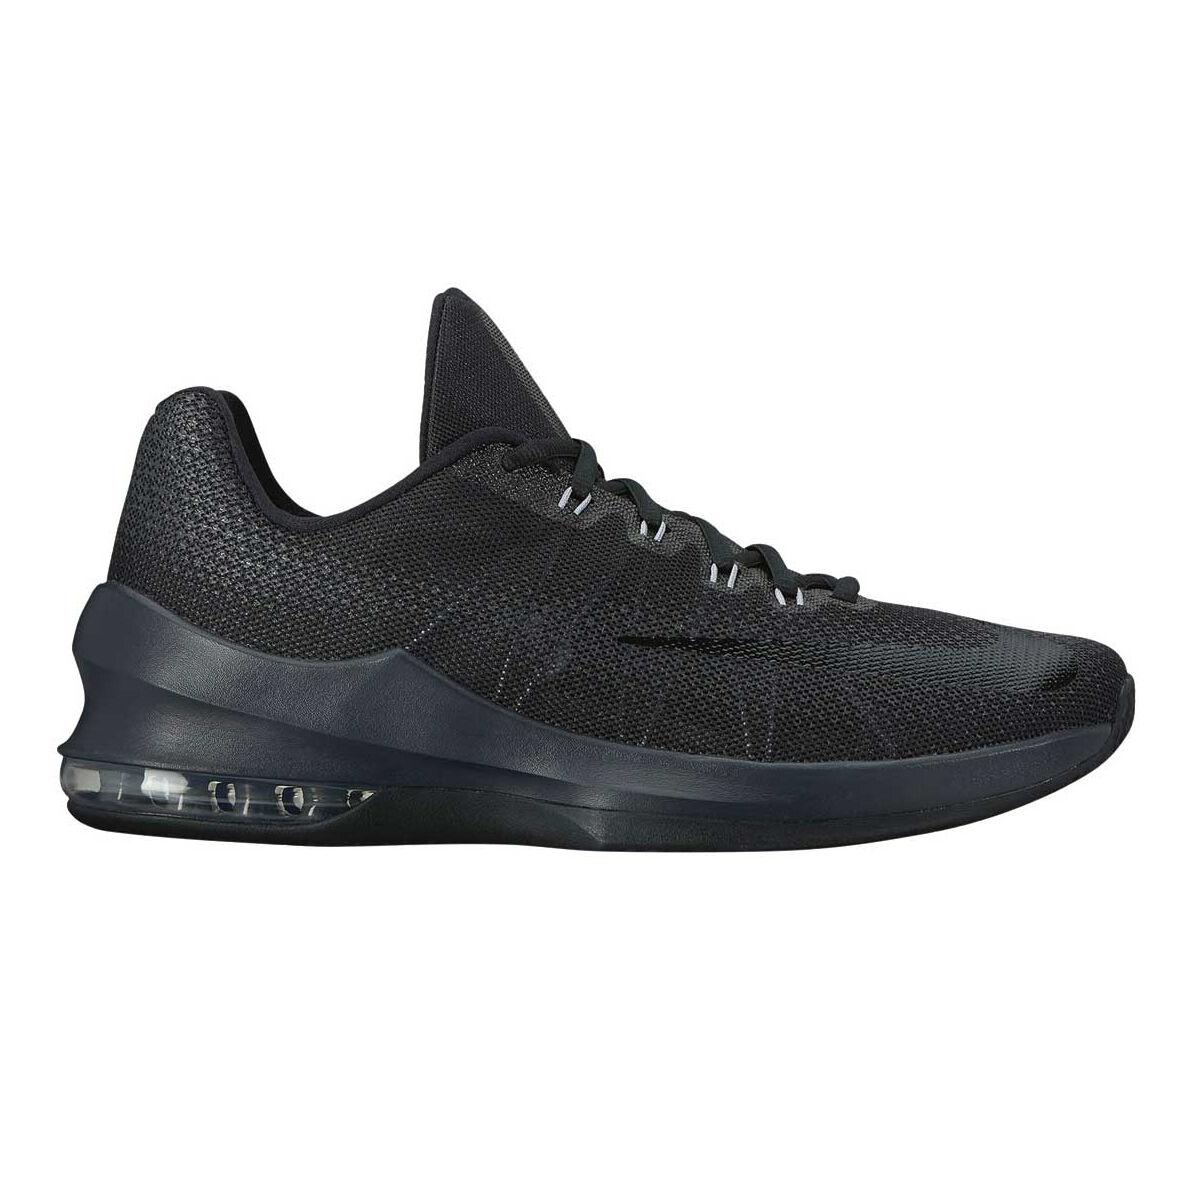 cb26227e54 switzerland nike air max infuriate low mens basketball shoes black us 7  black rebelhi 50704 c36b3